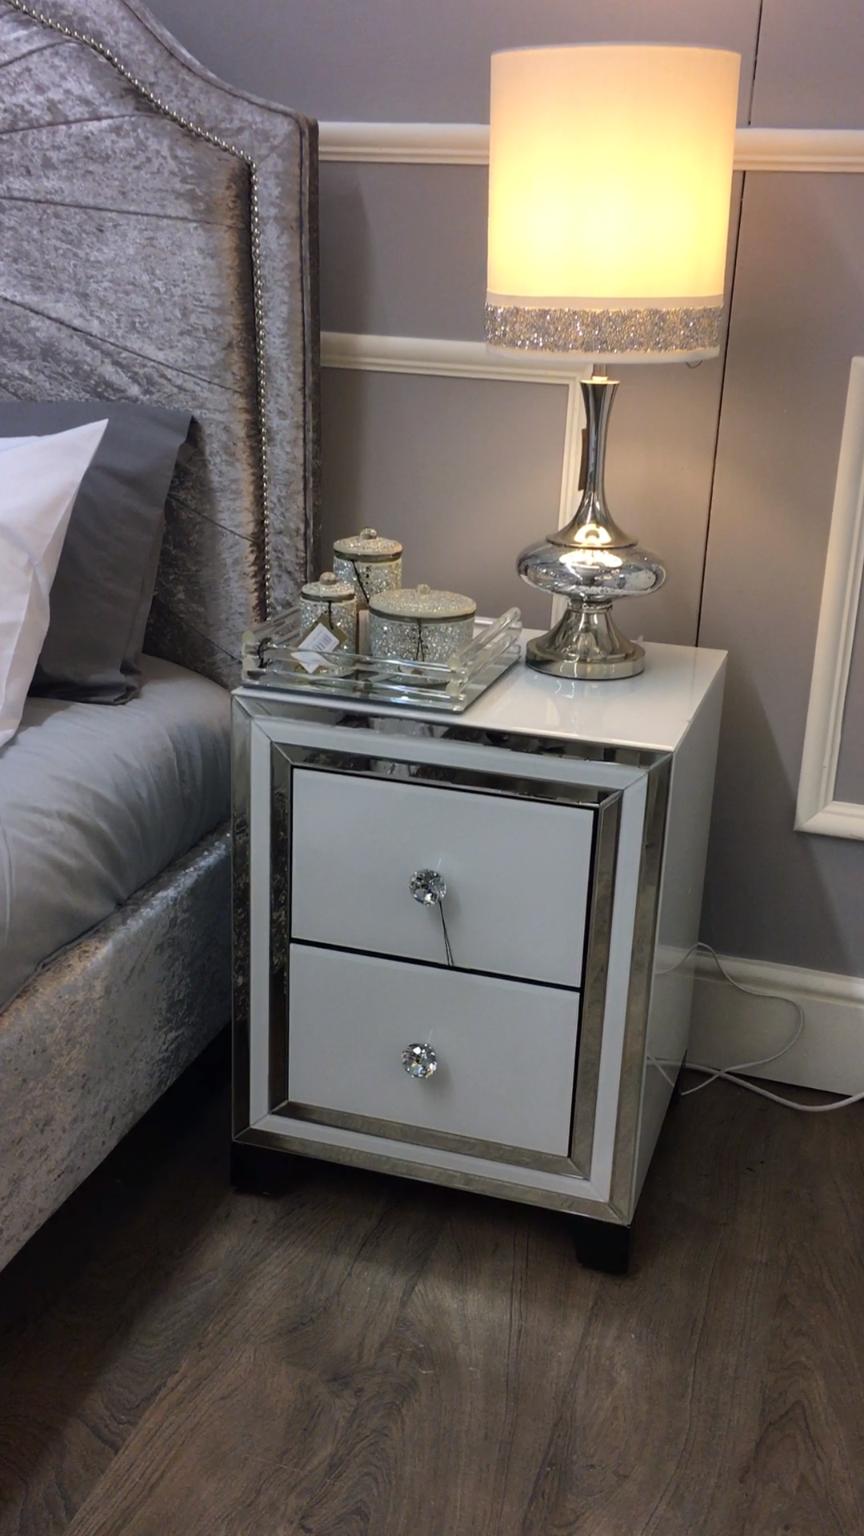 Madison White Glass 2 Drawer Cabinet - Lustrous white glass 2 drawer ...